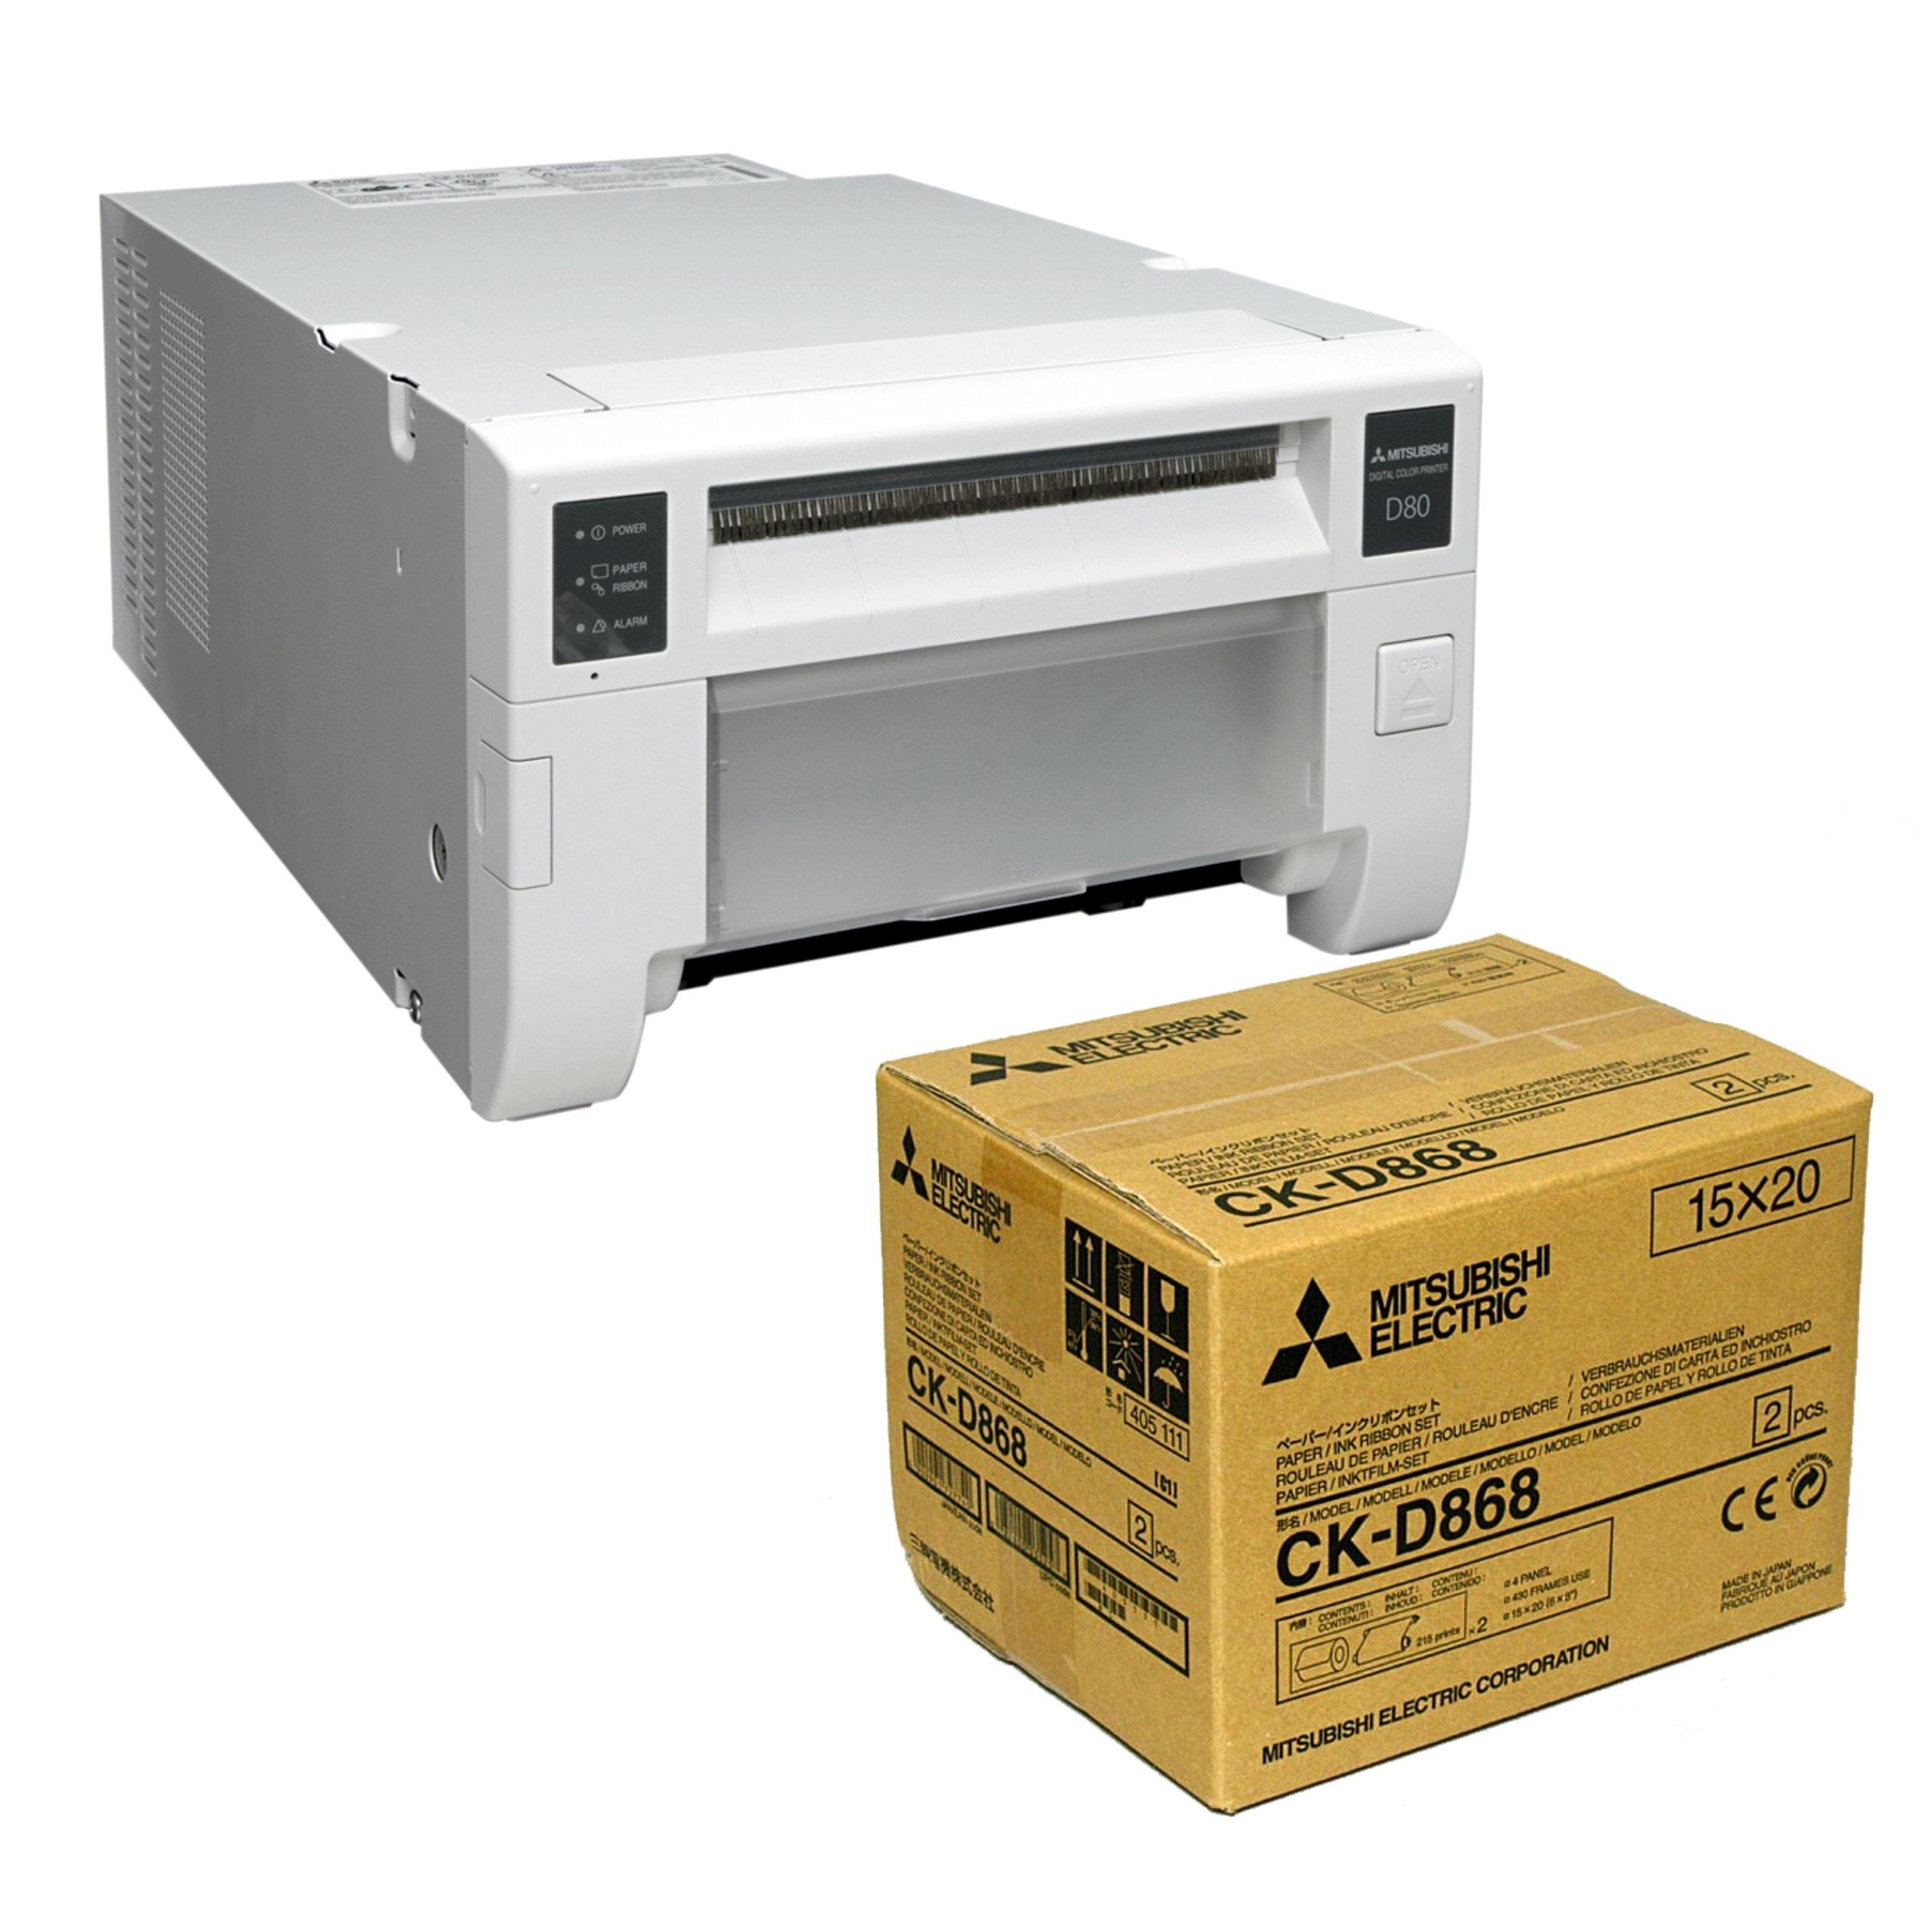 Impresora Mitsubishi CP-D80DW + Papel CK-D868 GRATIS